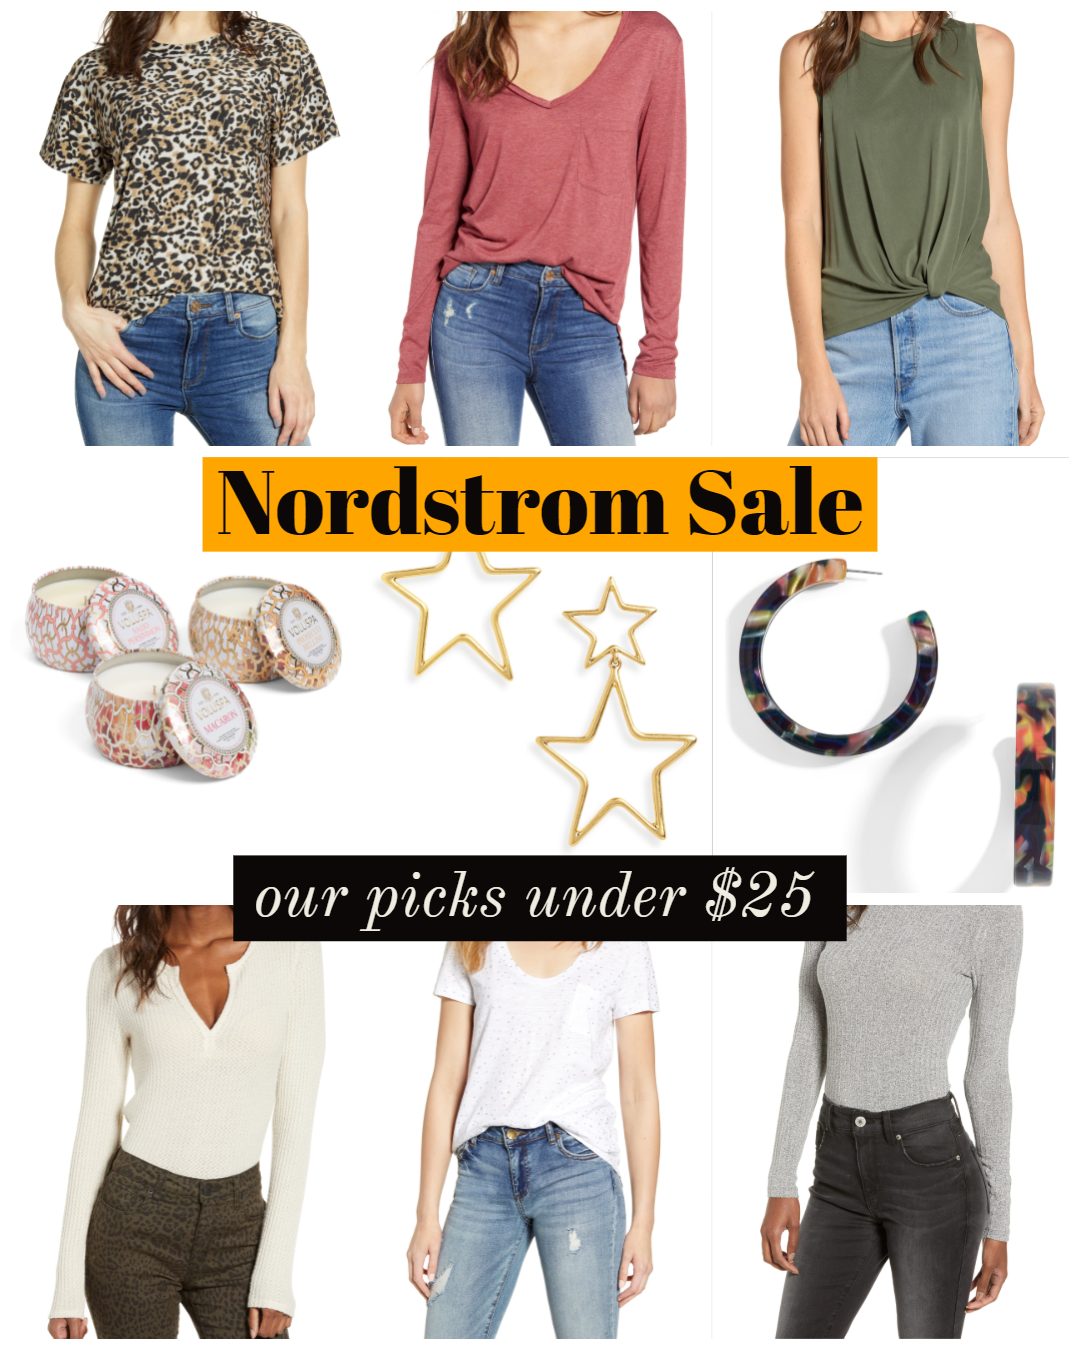 nordstrom sale under $25